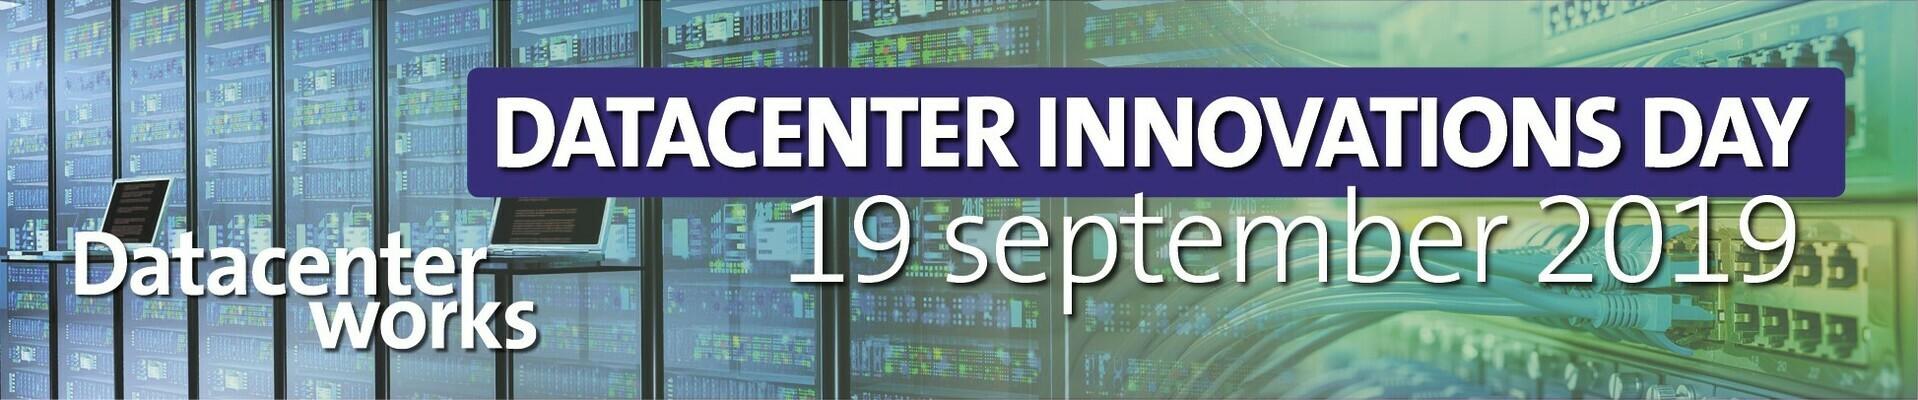 Datacenter Innovations Day